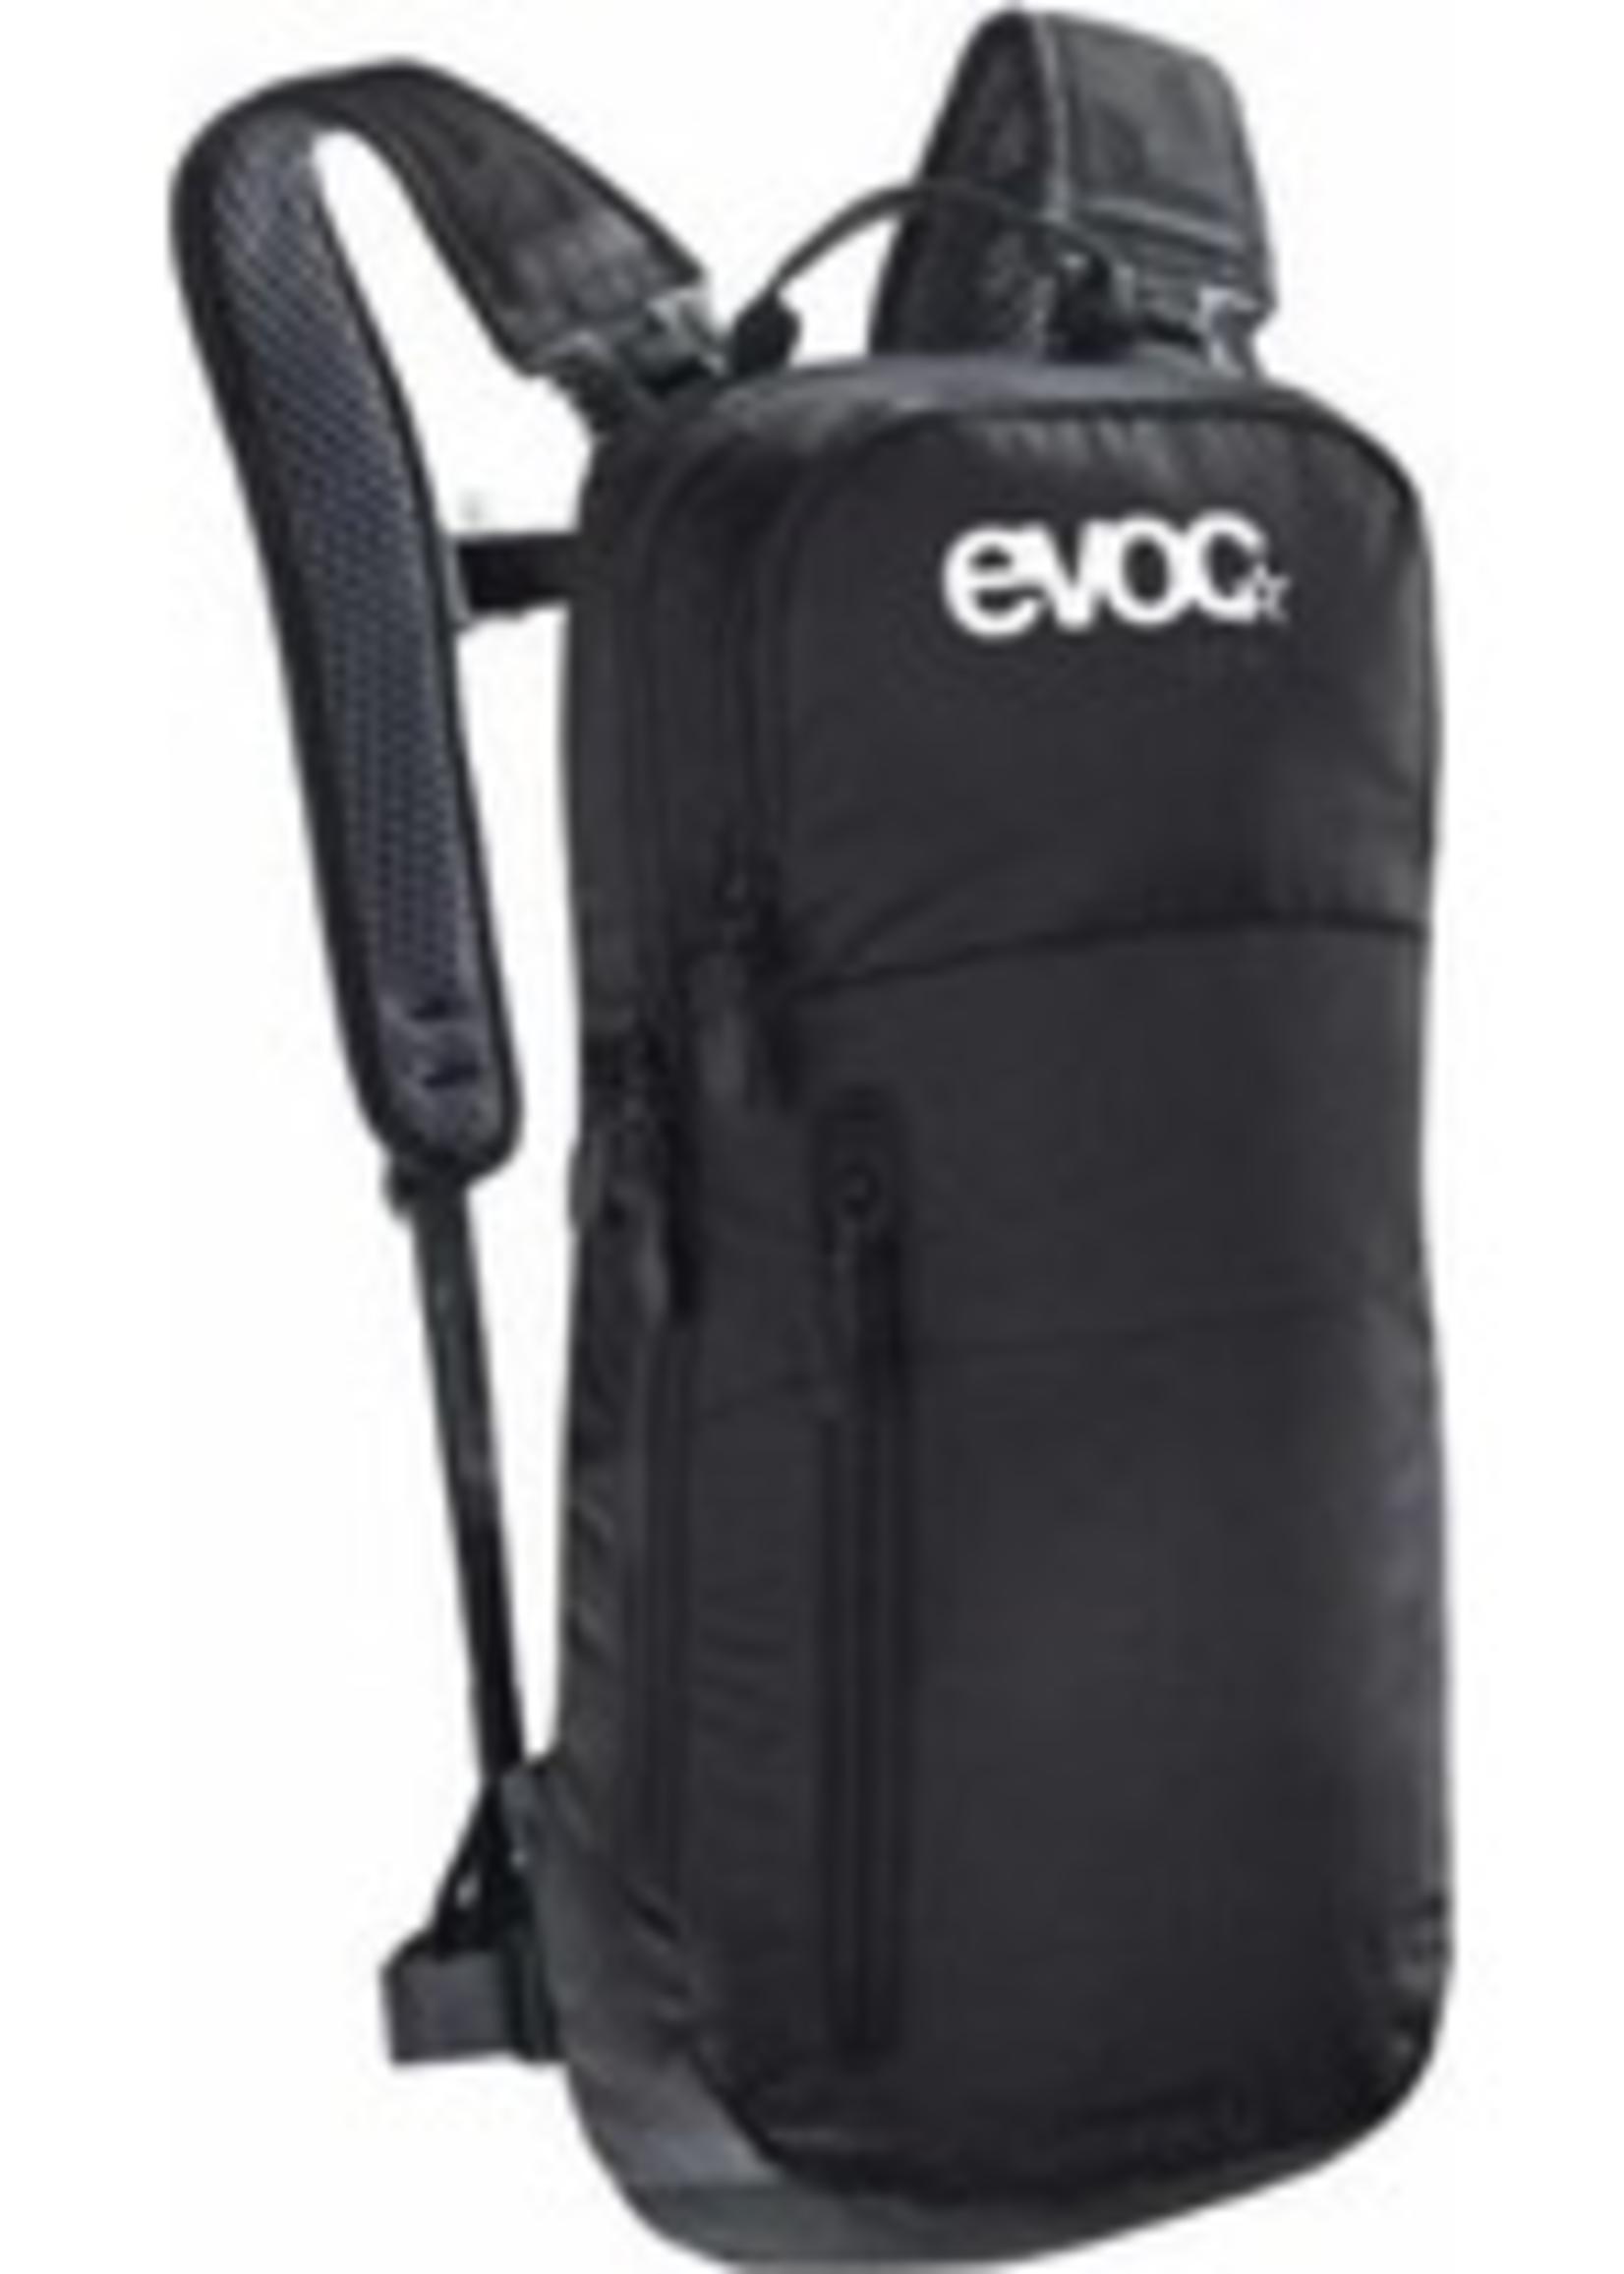 EVOC EVOC CC 6L HYDRATION BACK PACK